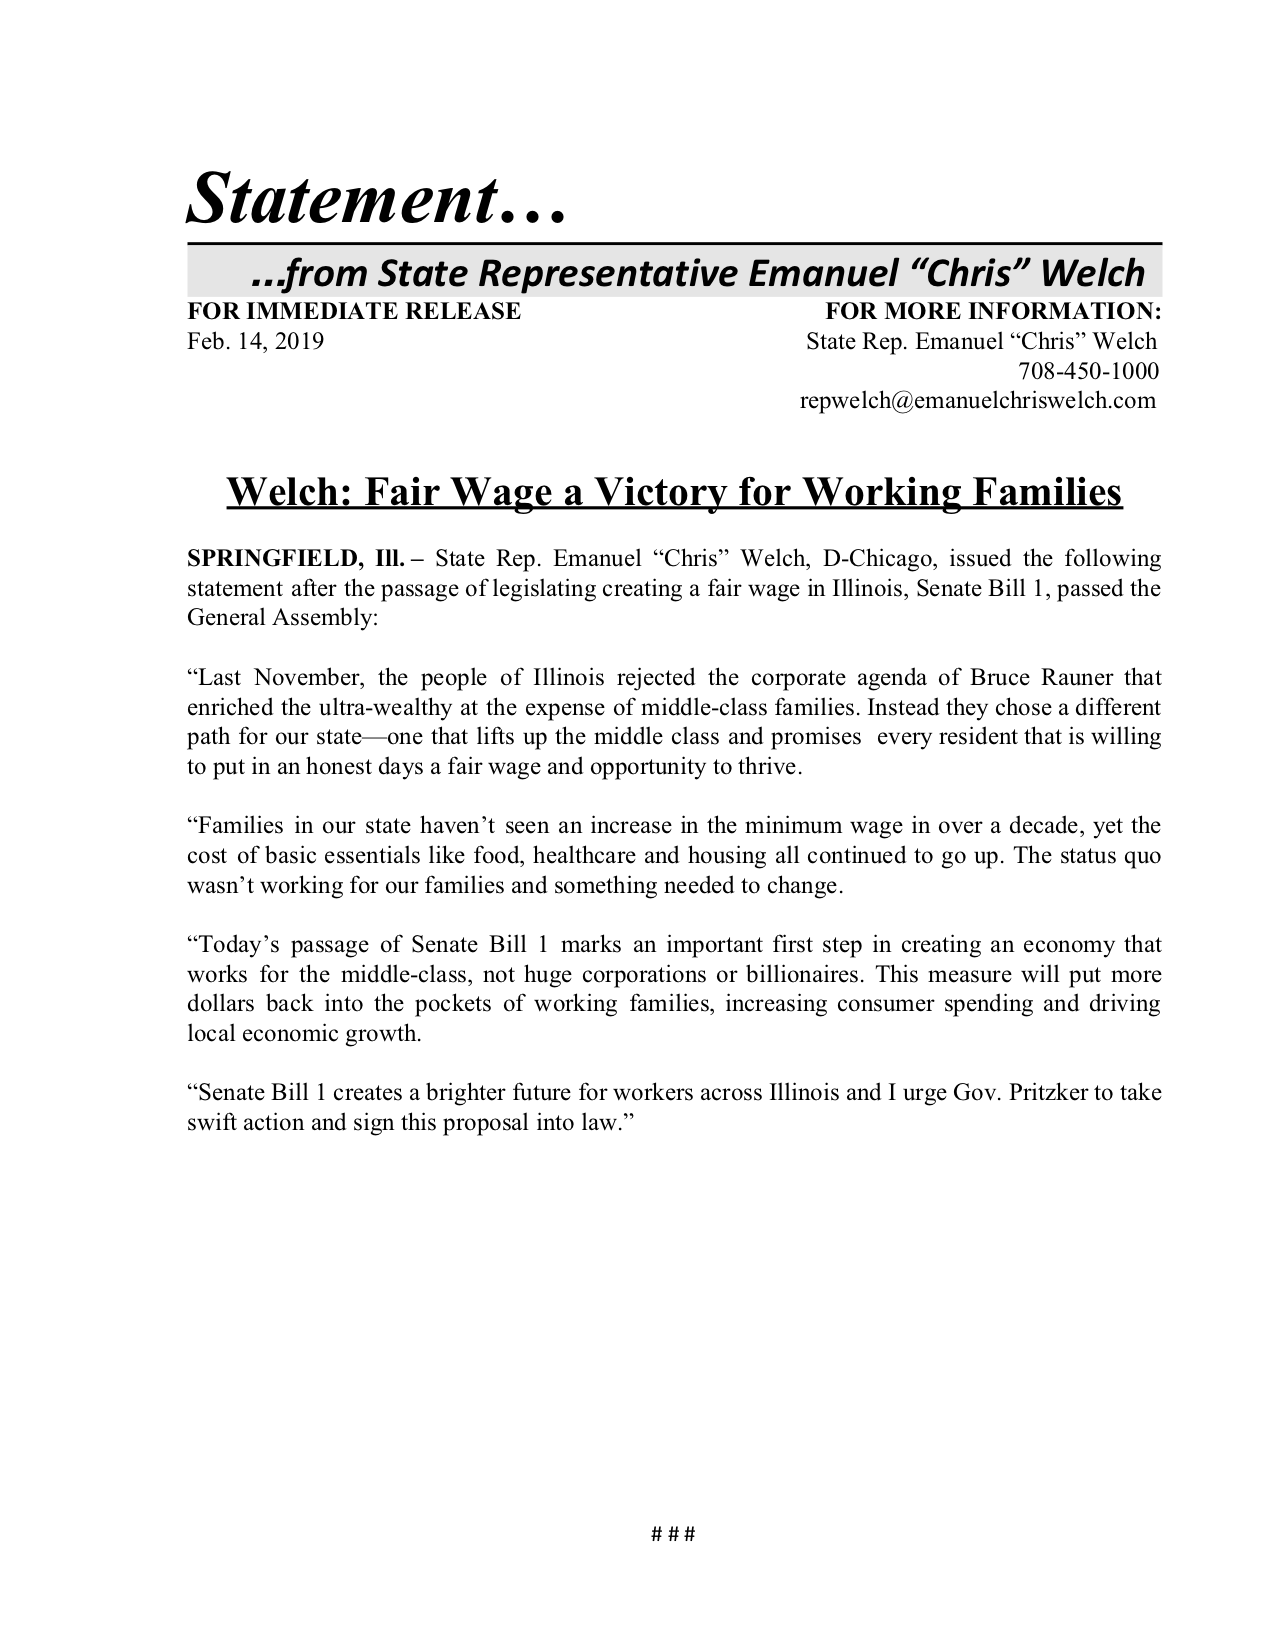 Willis, Welch to Spearhead Hearing Examining Westlake Hospital Closure  (February 14, 2019)